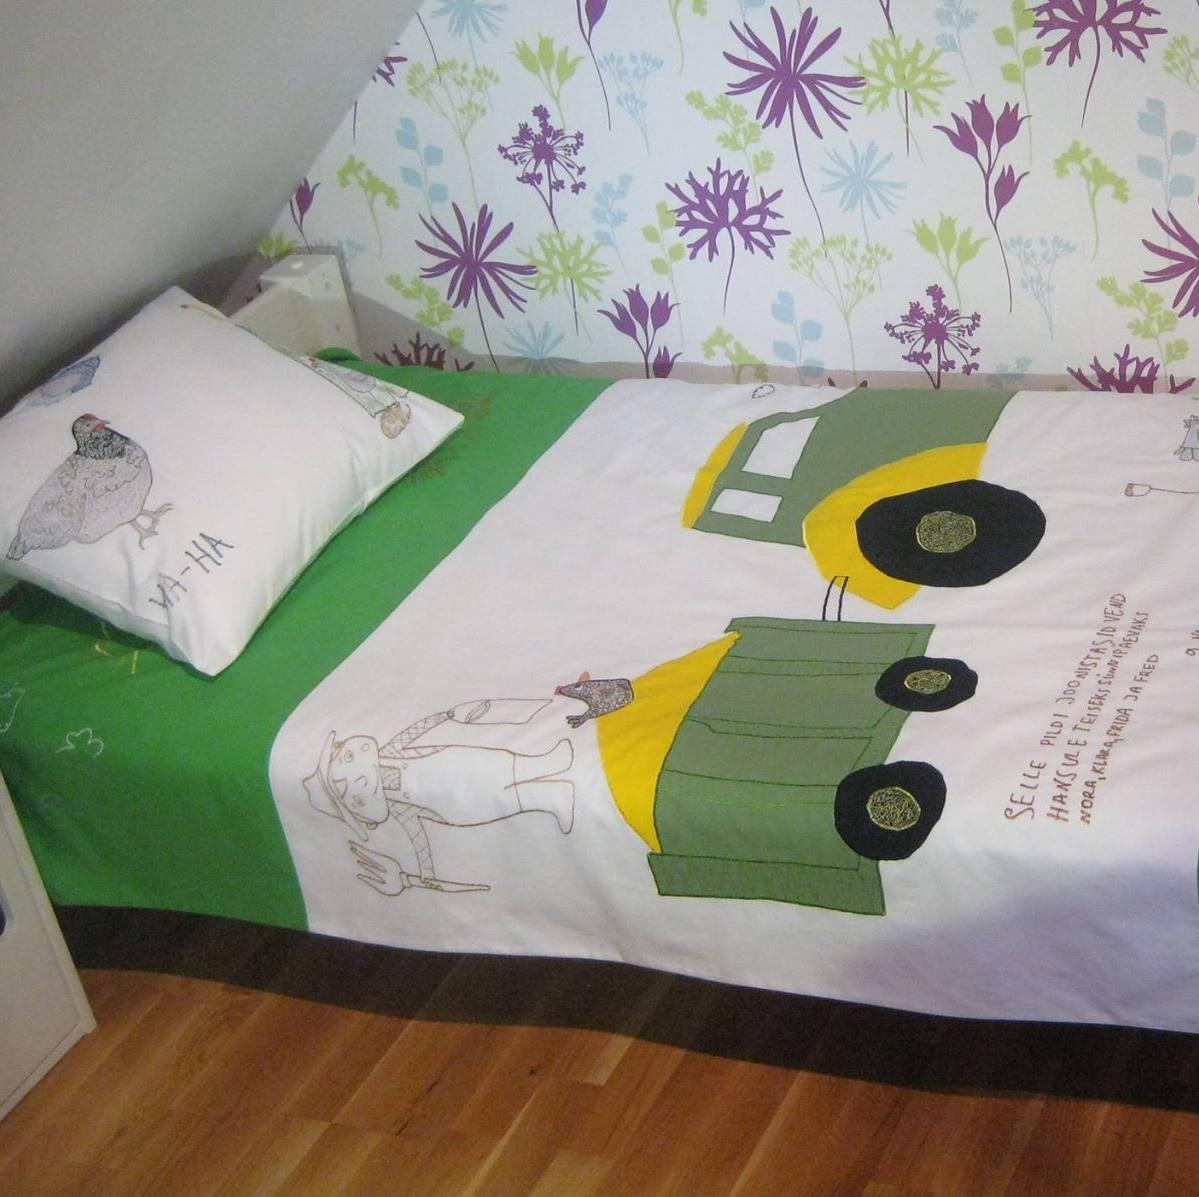 Telli enda disainitud pildiga voodipesu